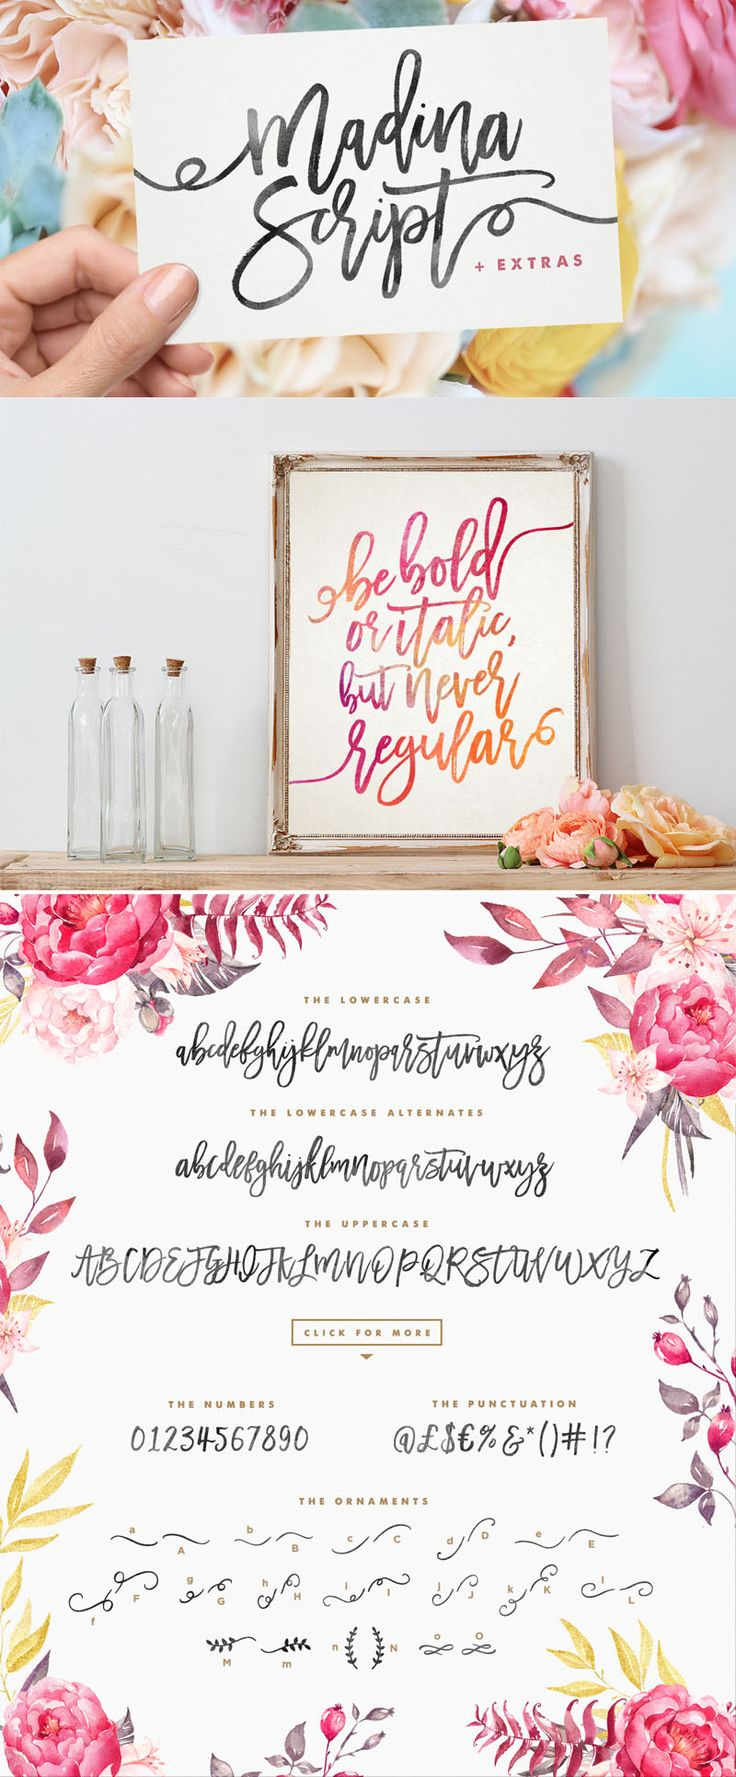 My Latest Font Obsessions   Key Lime Digital Designs   Bloglovin'                                                                                                                                                                                 More